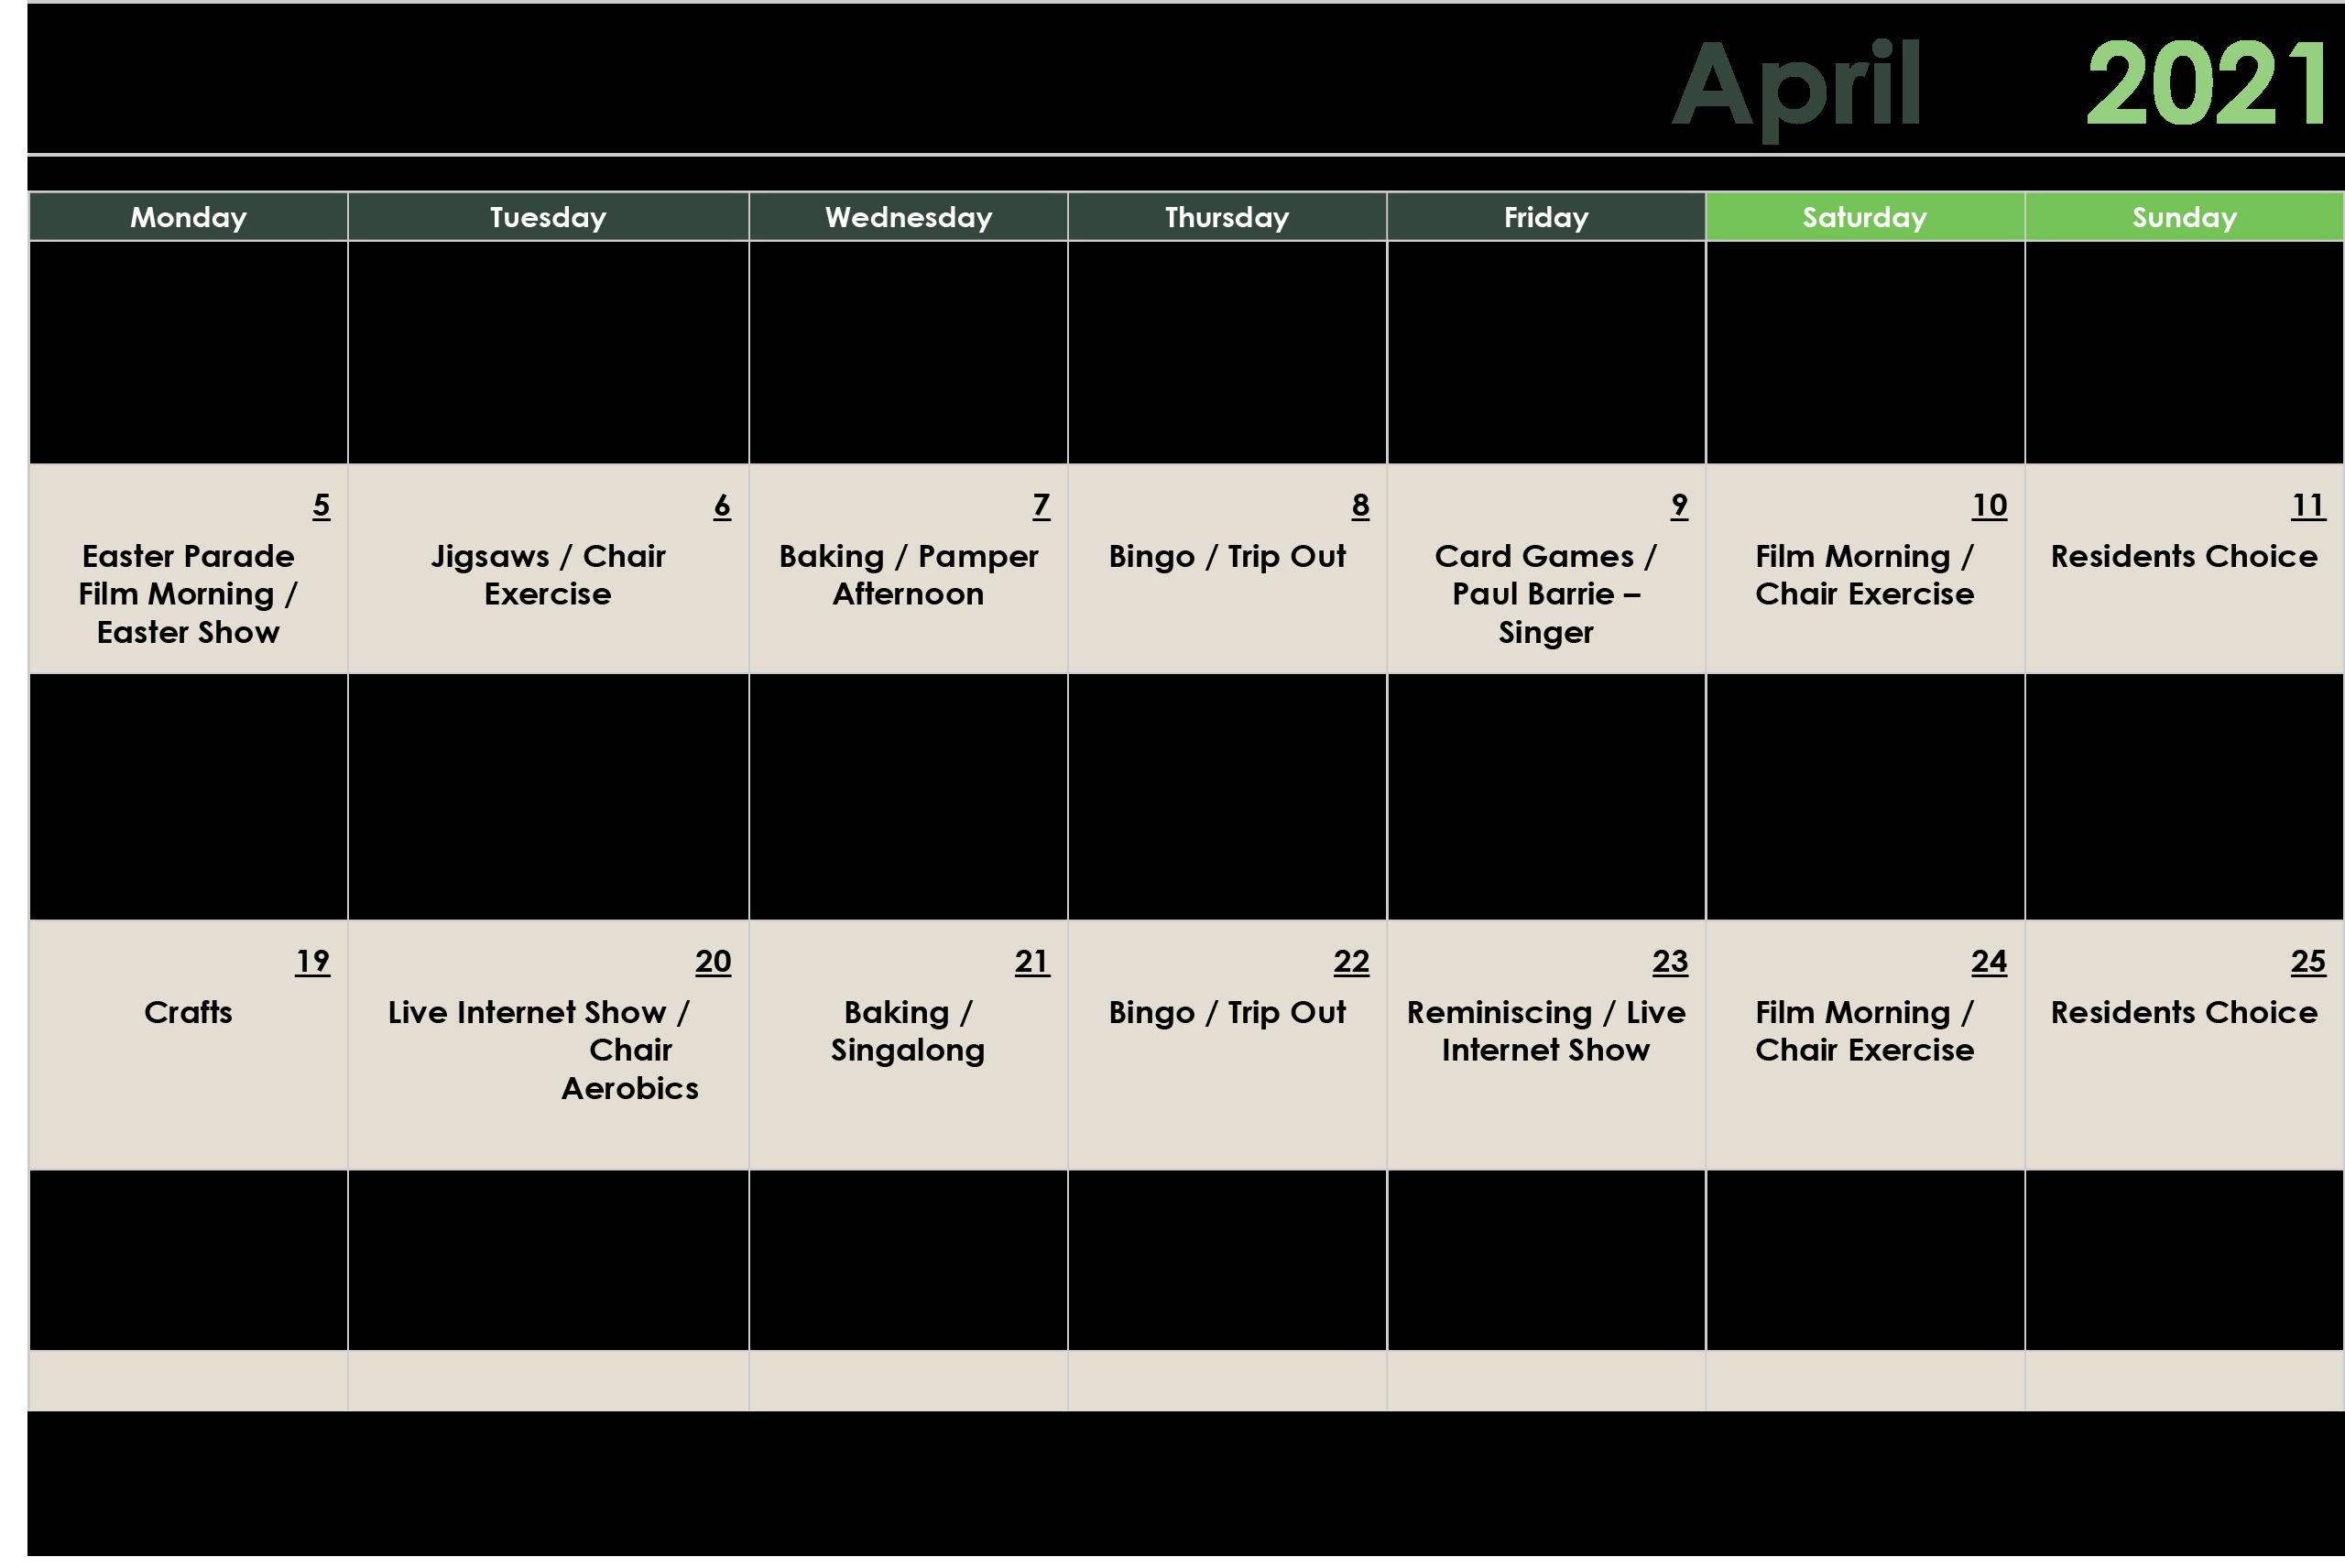 April 2021 Activity Calendar